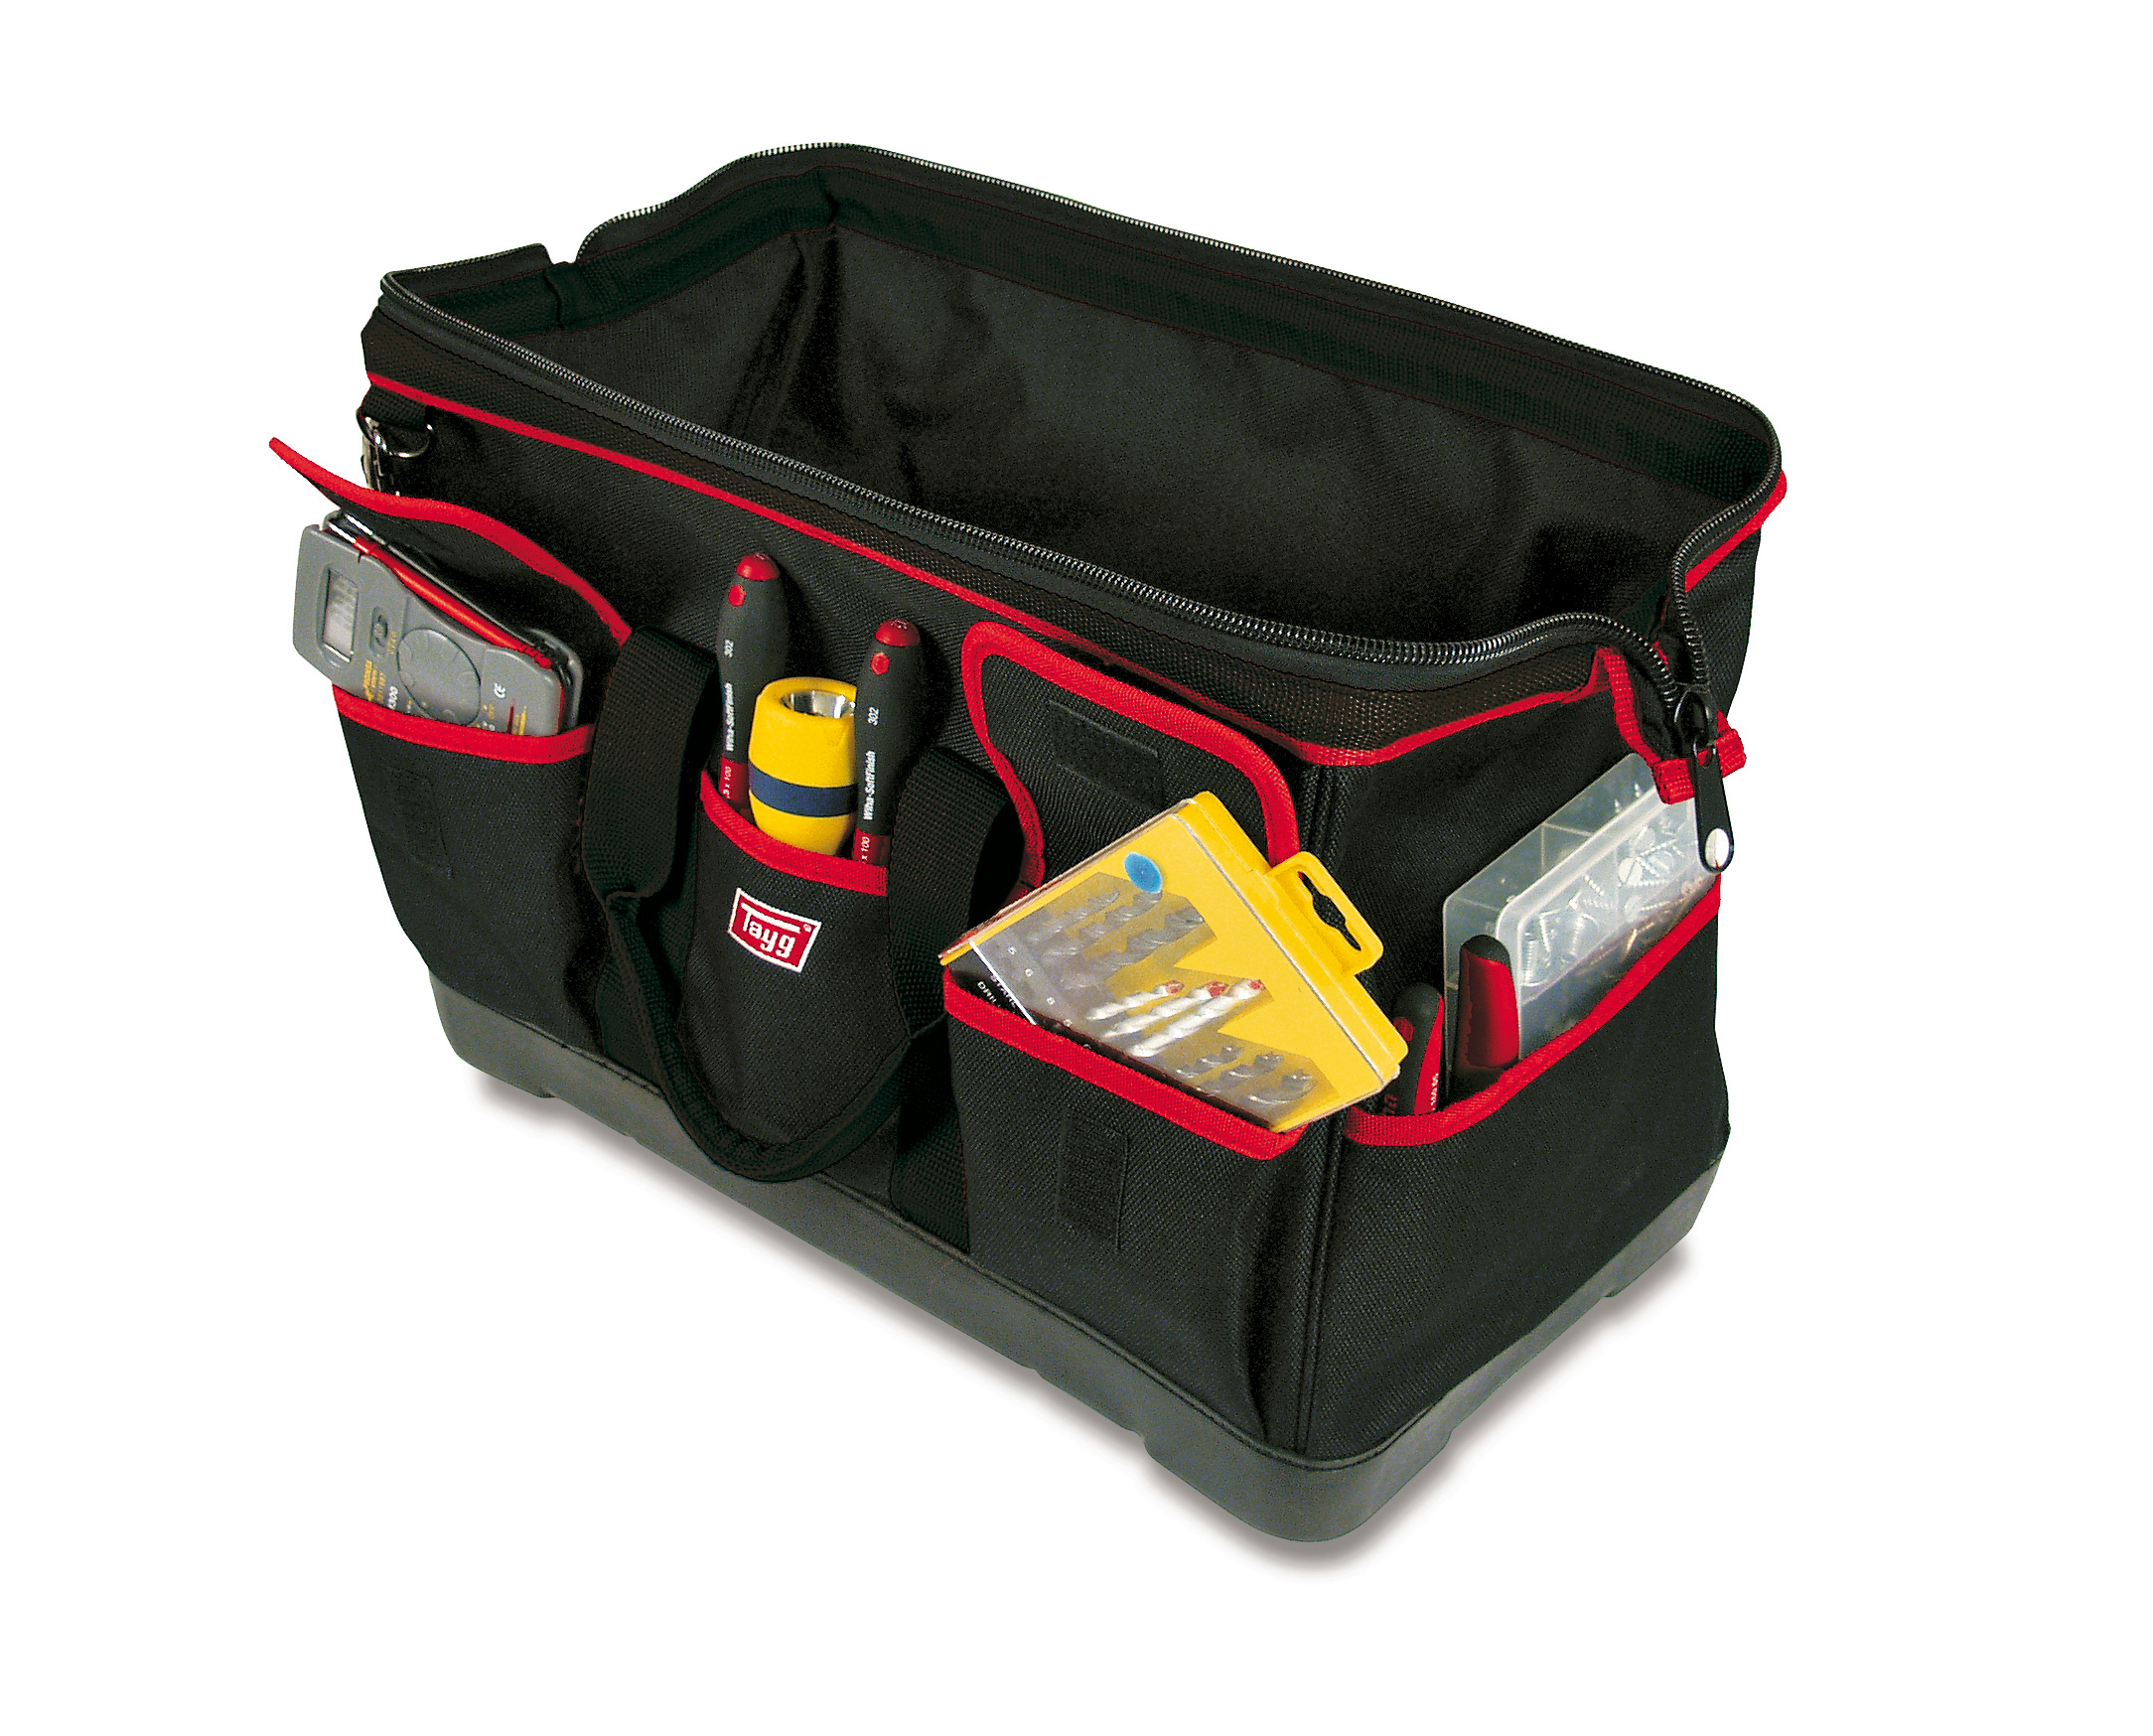 1 bolsas de herramientas mod bn 3 - Bolsas de Herramientas